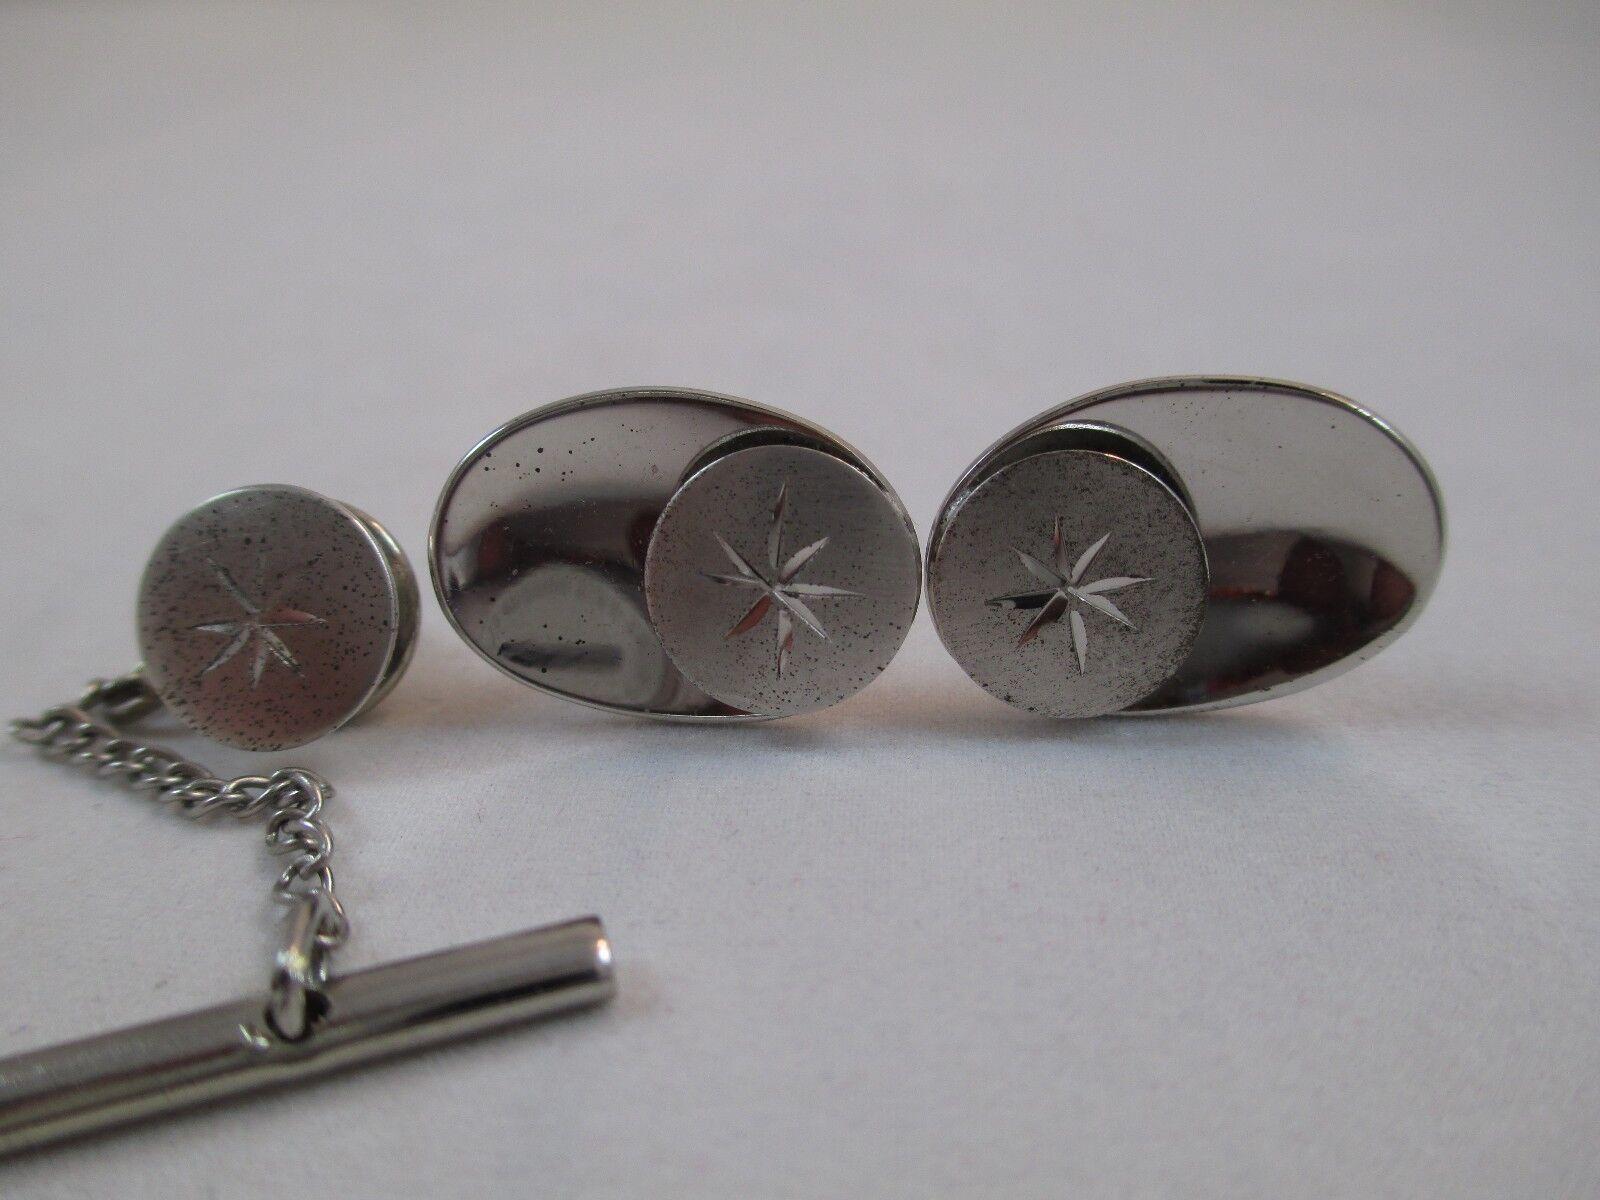 Vintage Silver and Black Hematite Cufflinks Cuff Links for Men Shiny Polished Signed Hickok USA Cuff Links Unisex Modernist Cufflinks